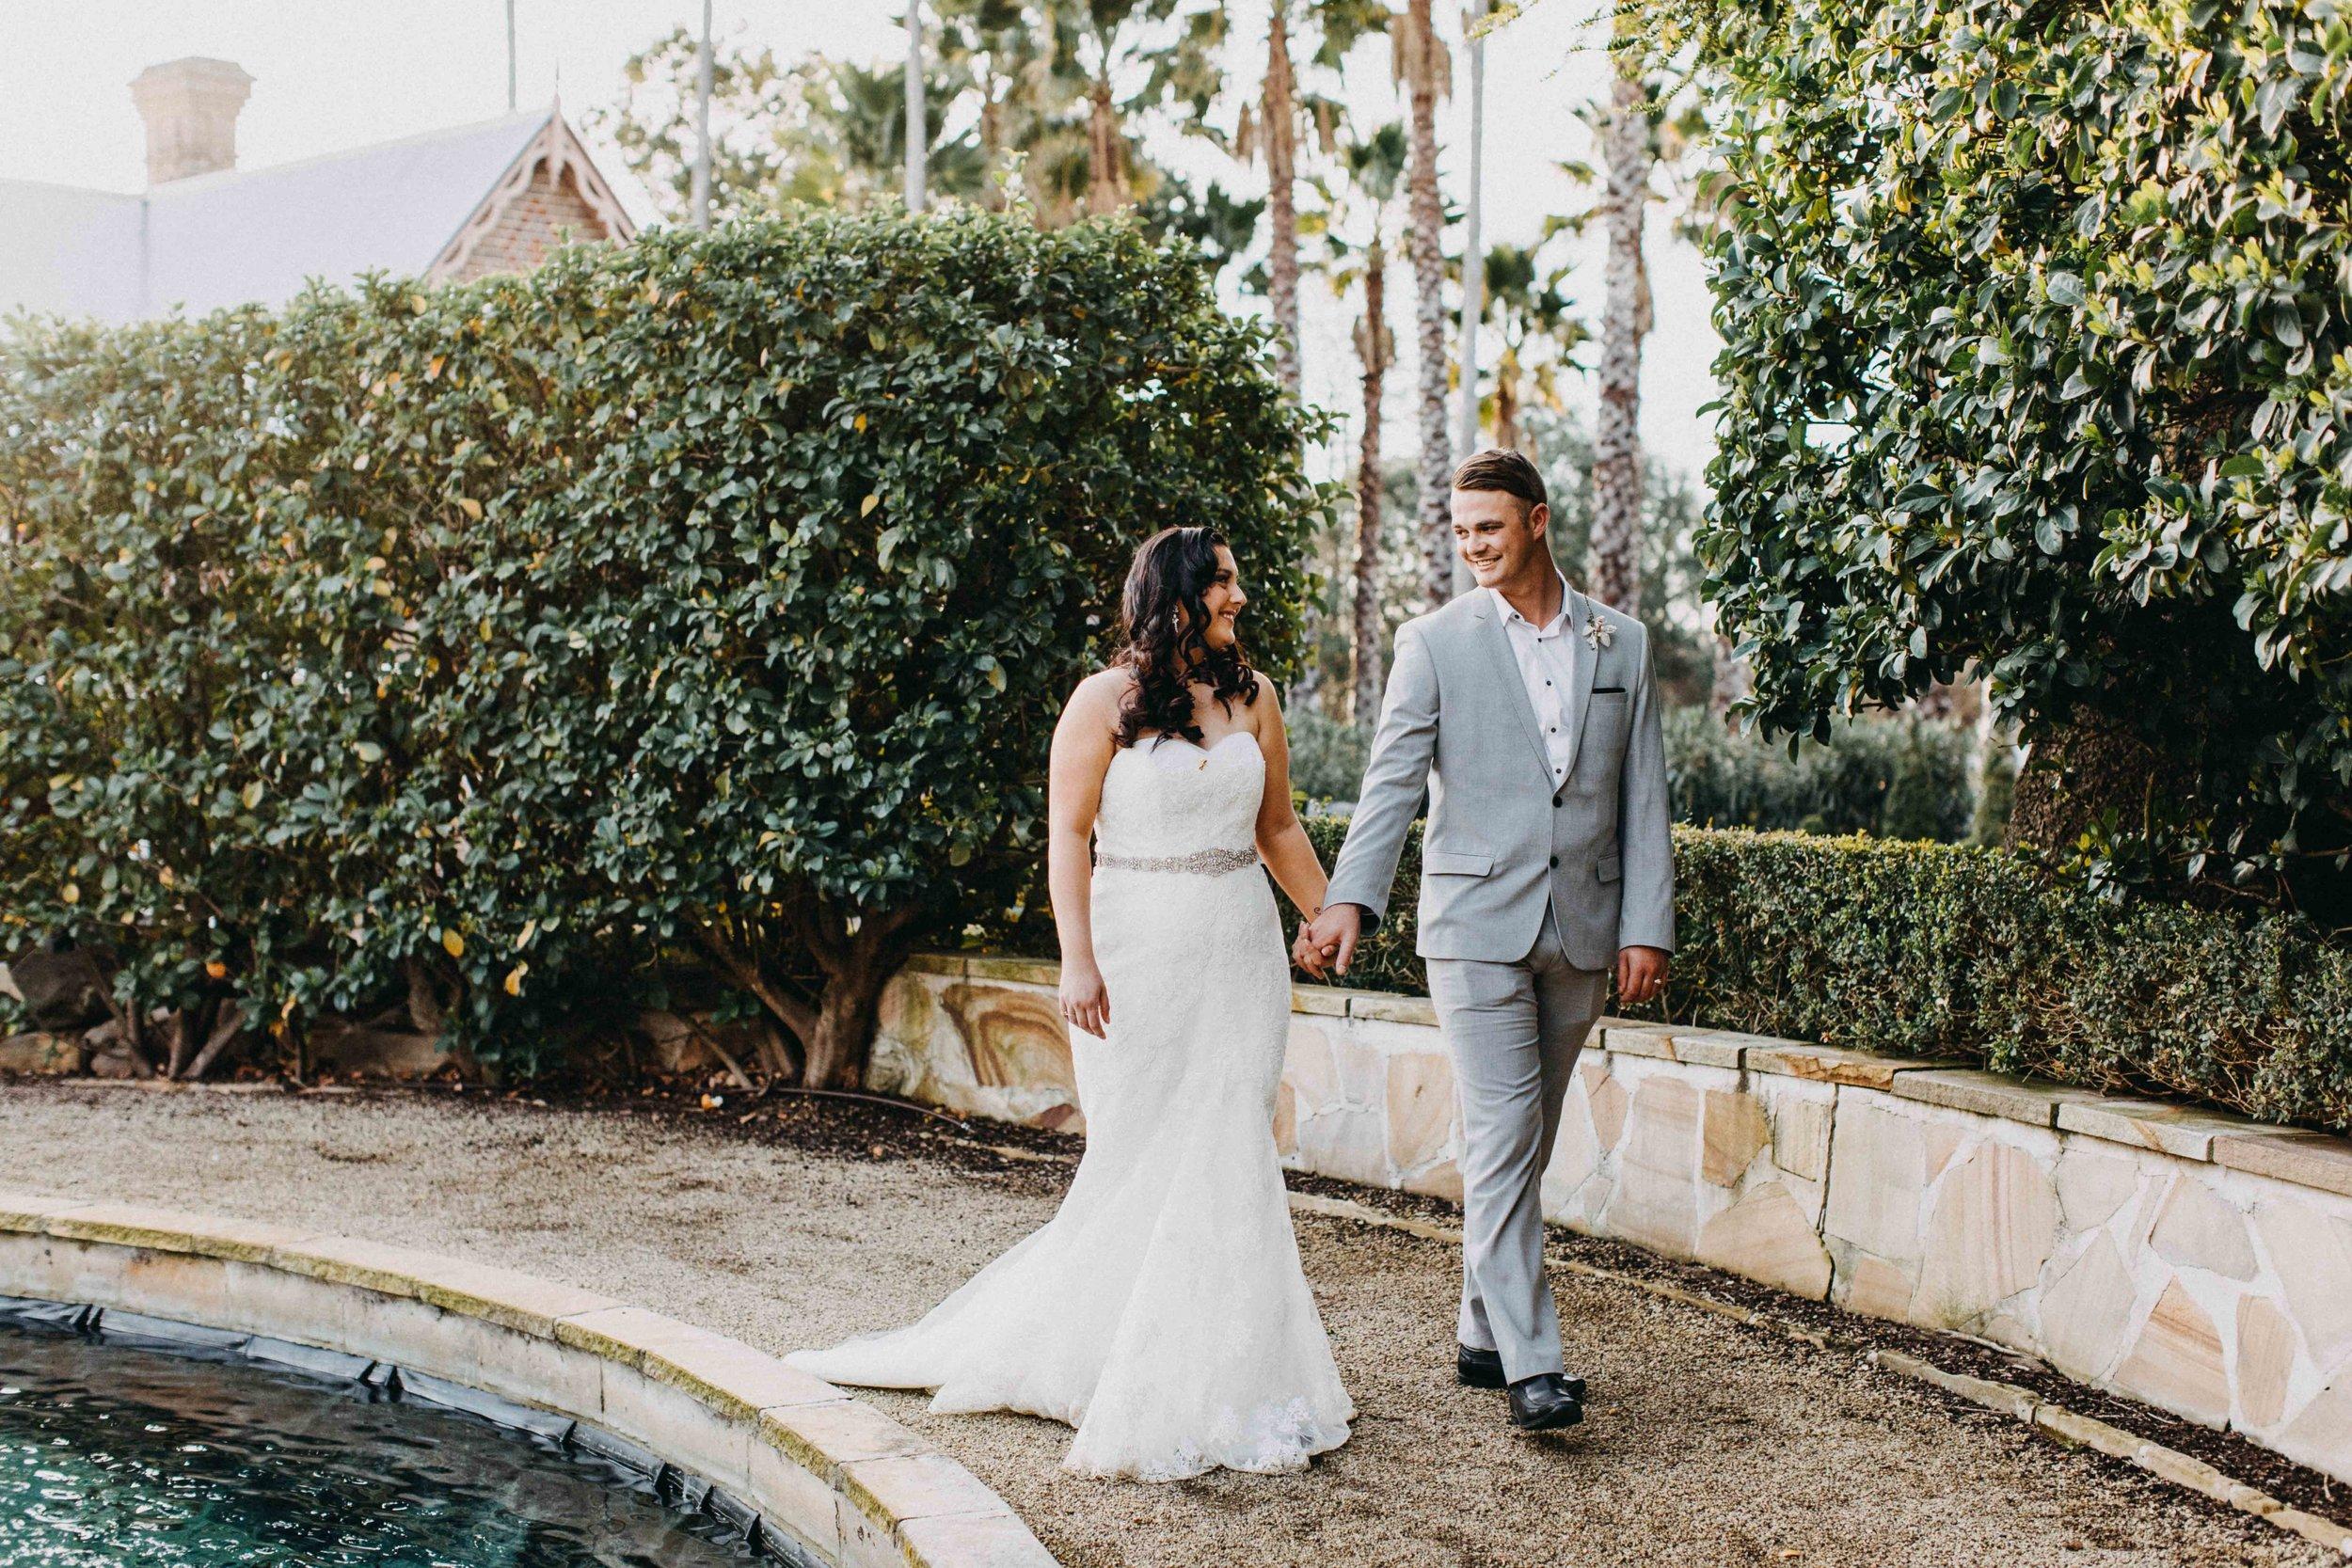 burnham-grove-camden-wedding-emilyobrienphotography-macarthur-107.jpg